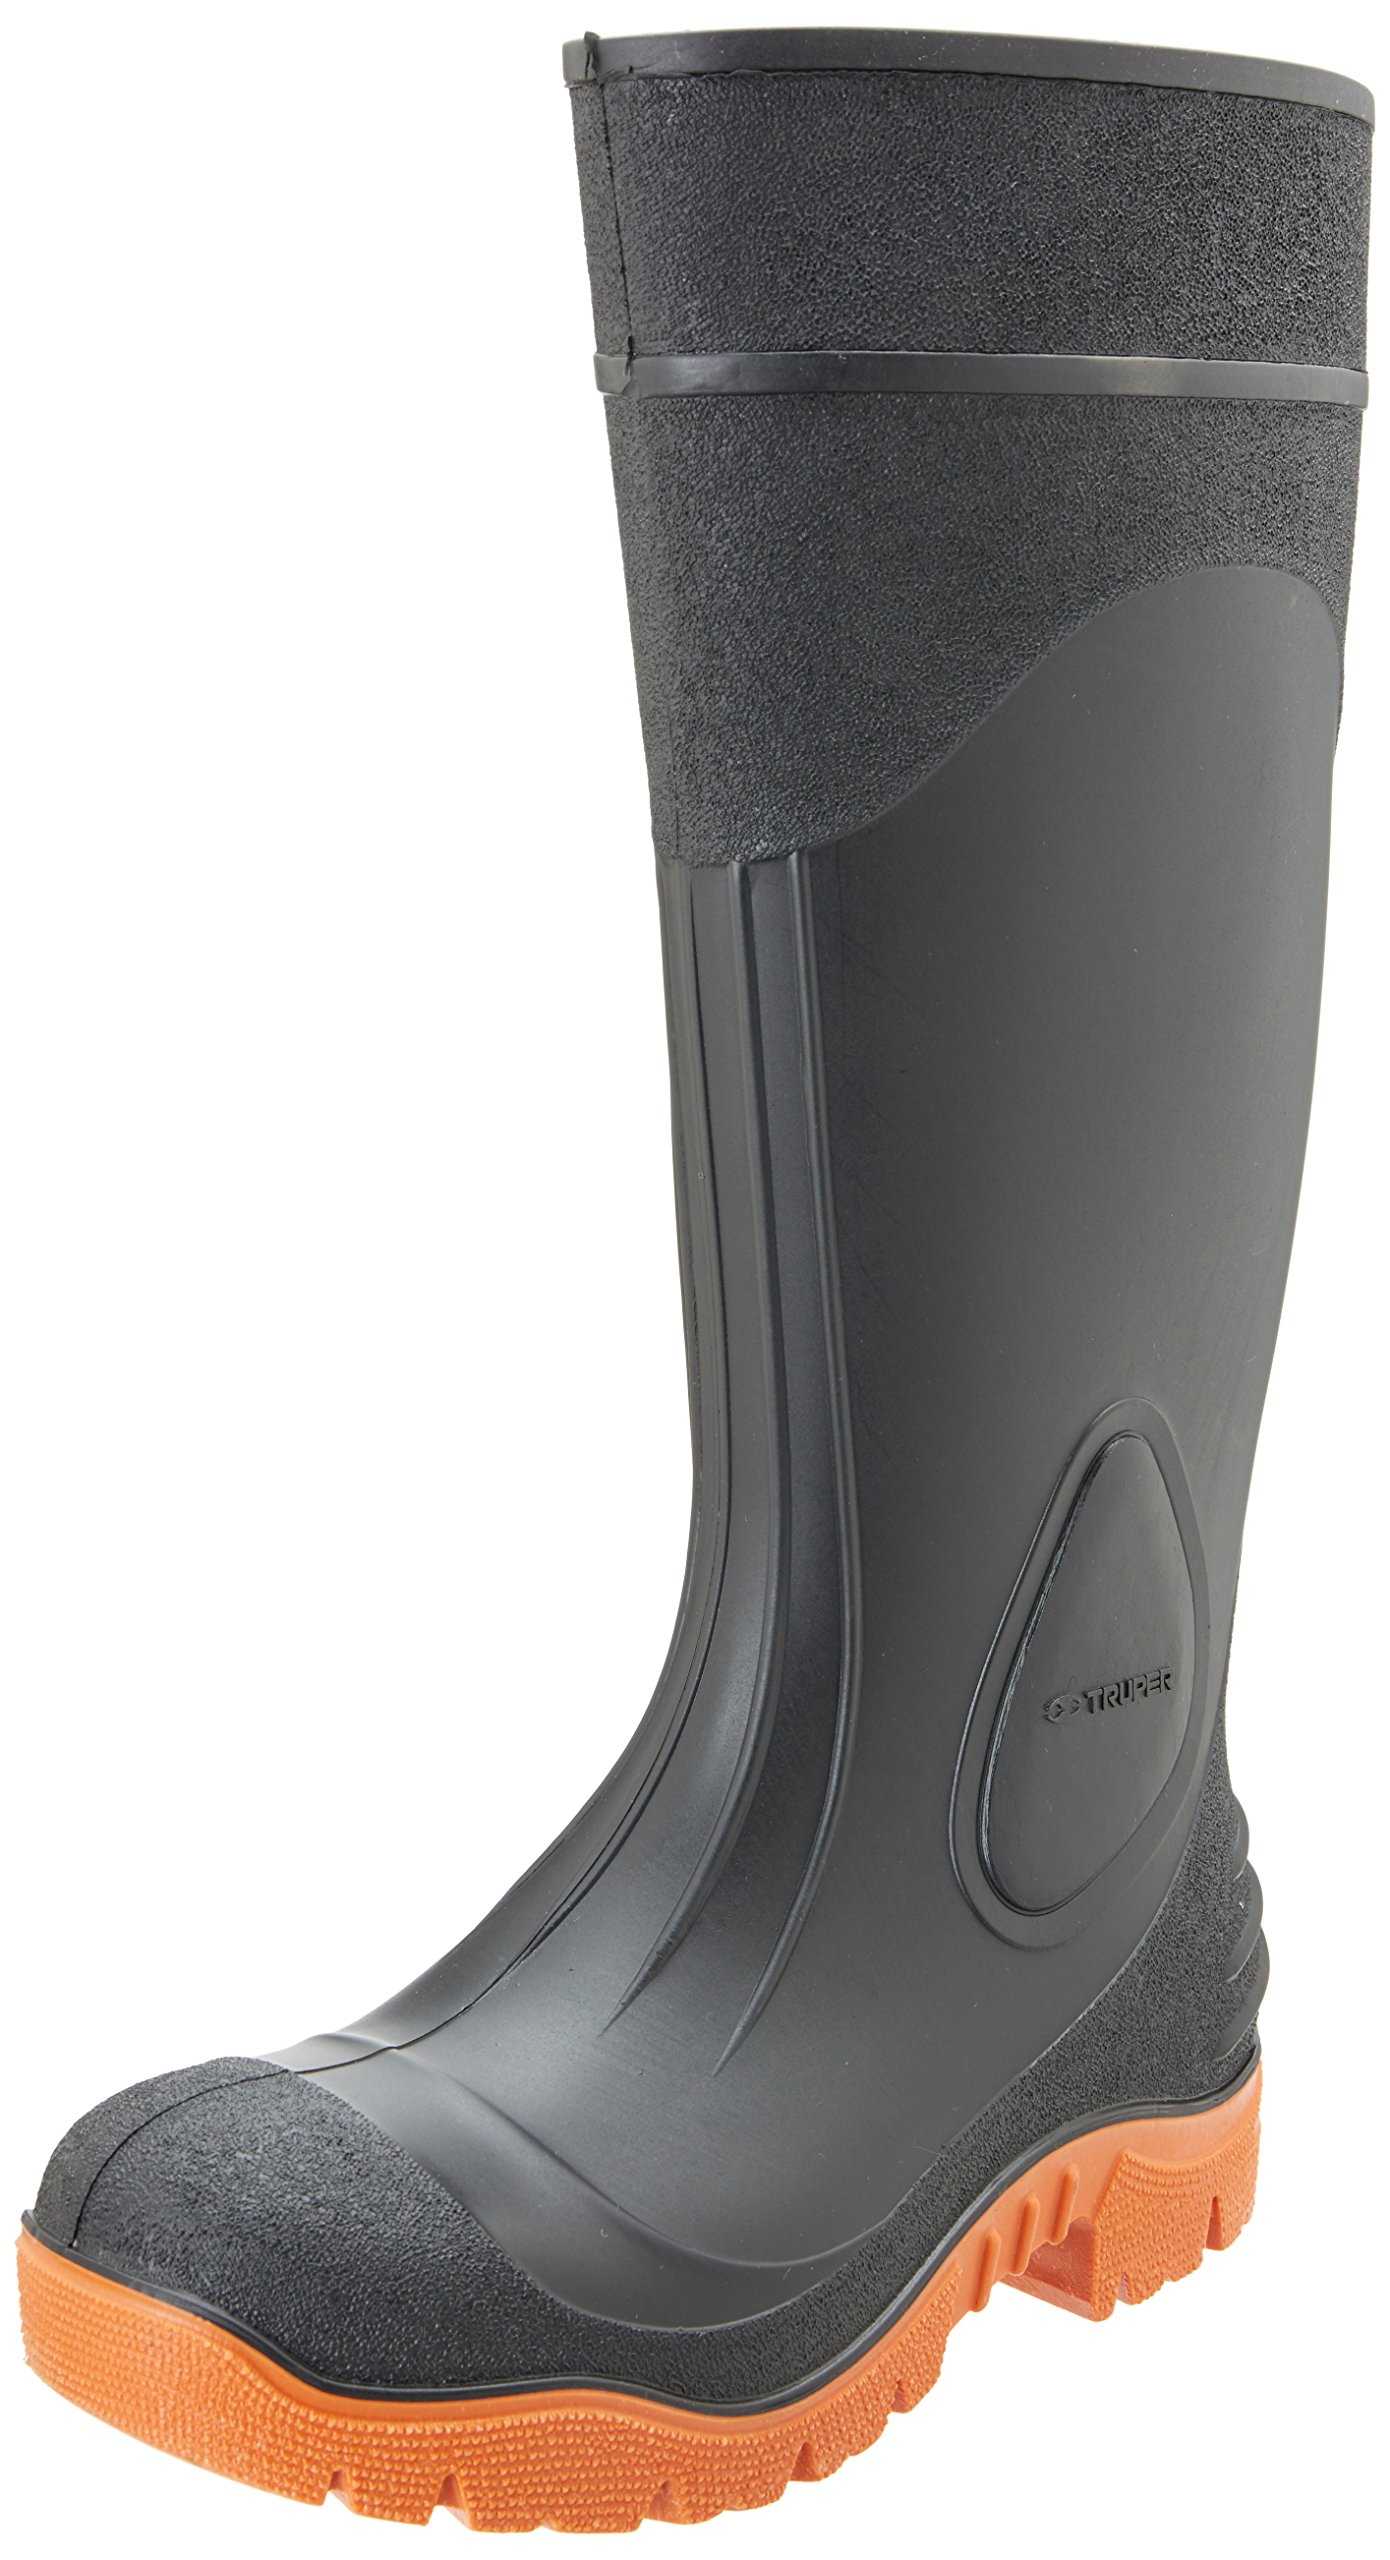 TRUPER BOT-26I Black Rubber Work Boots. Size 8